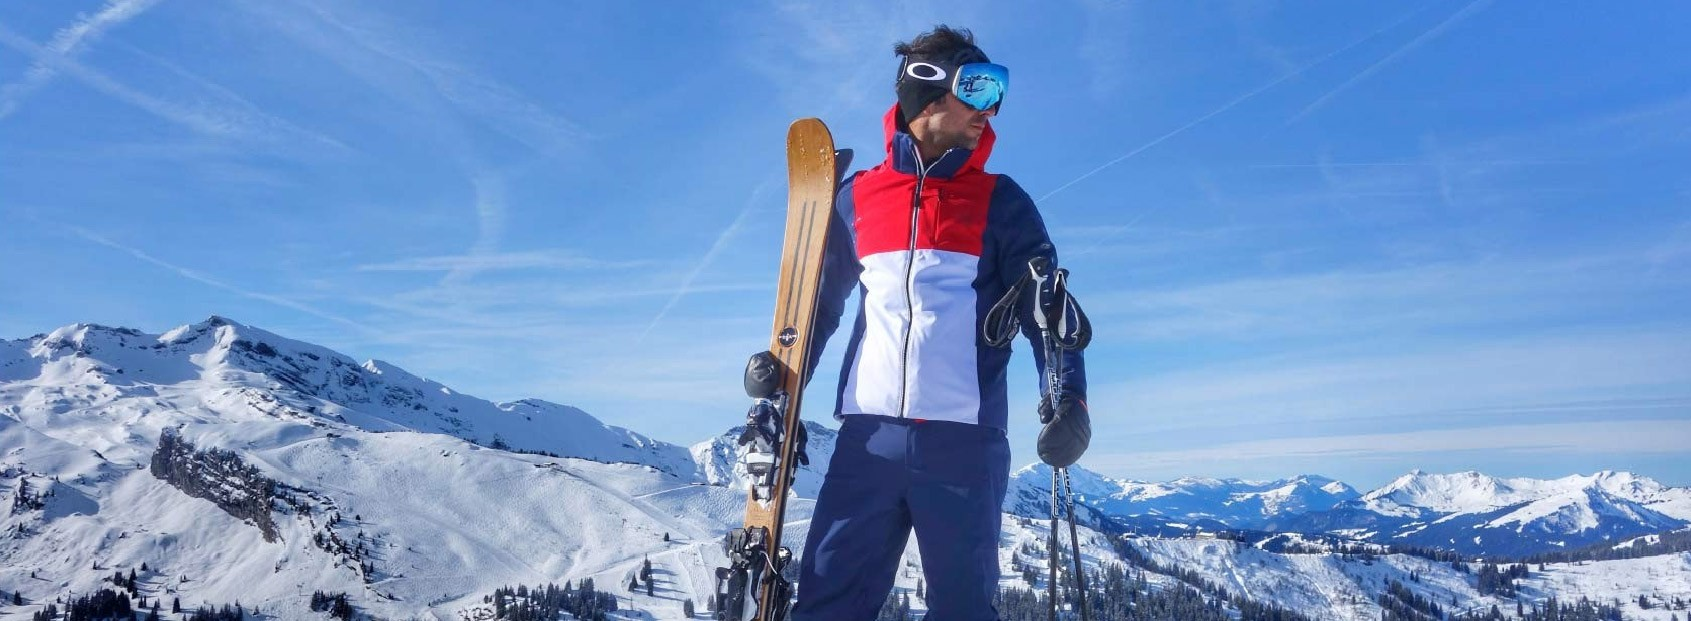 Skis Marcel Livet